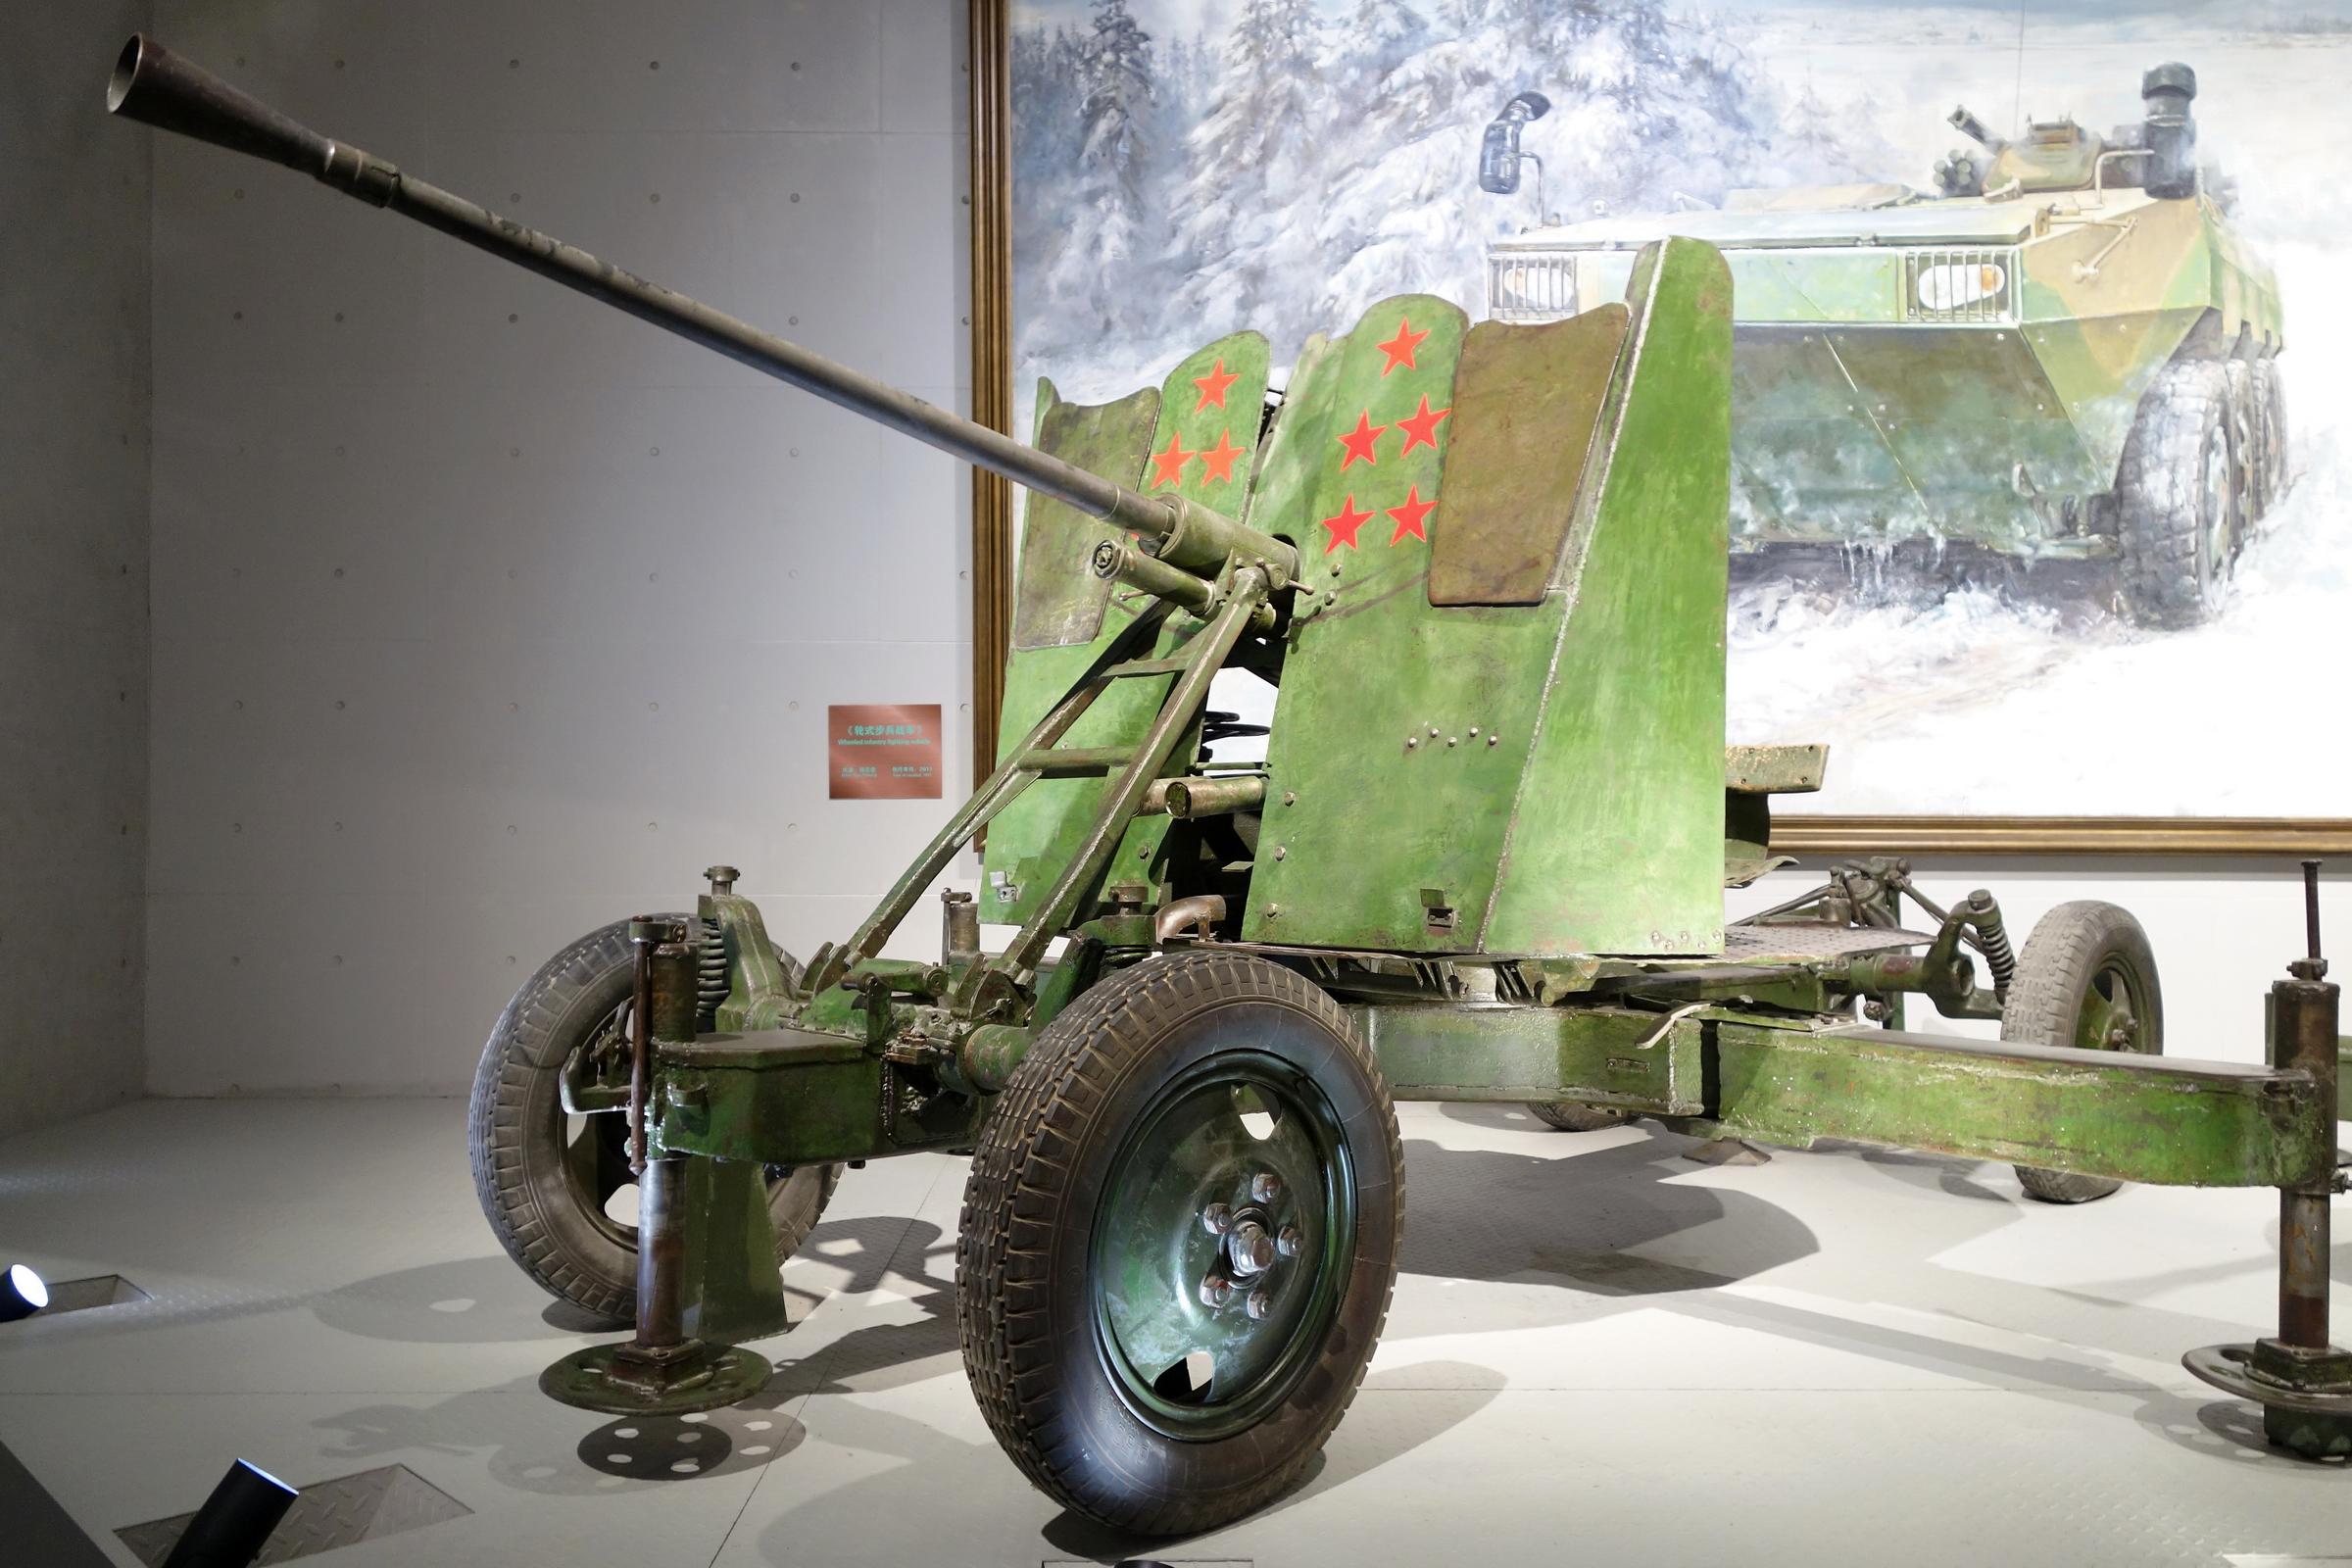 File:37mm Anti-Aircraft Gun M1939 20181020 jpg - Wikimedia